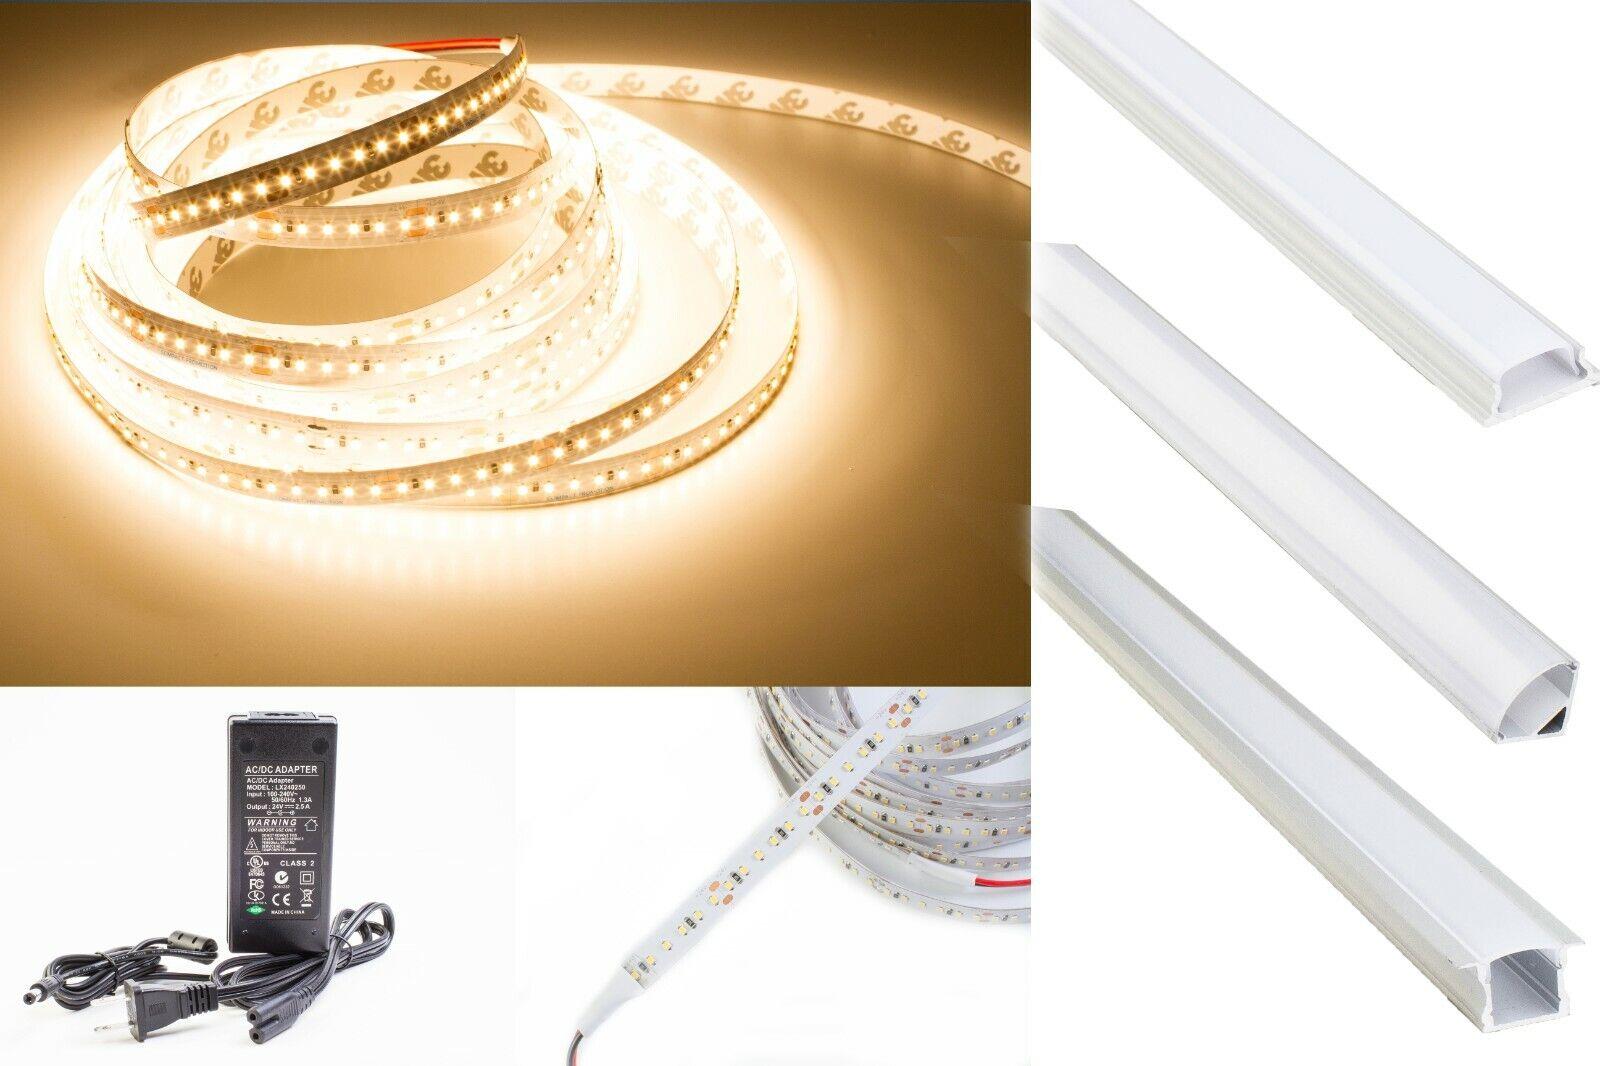 90 CRI LED Strip Light Warm Weiß 24v 3000K 2216 + Aluminum Channel + UL power